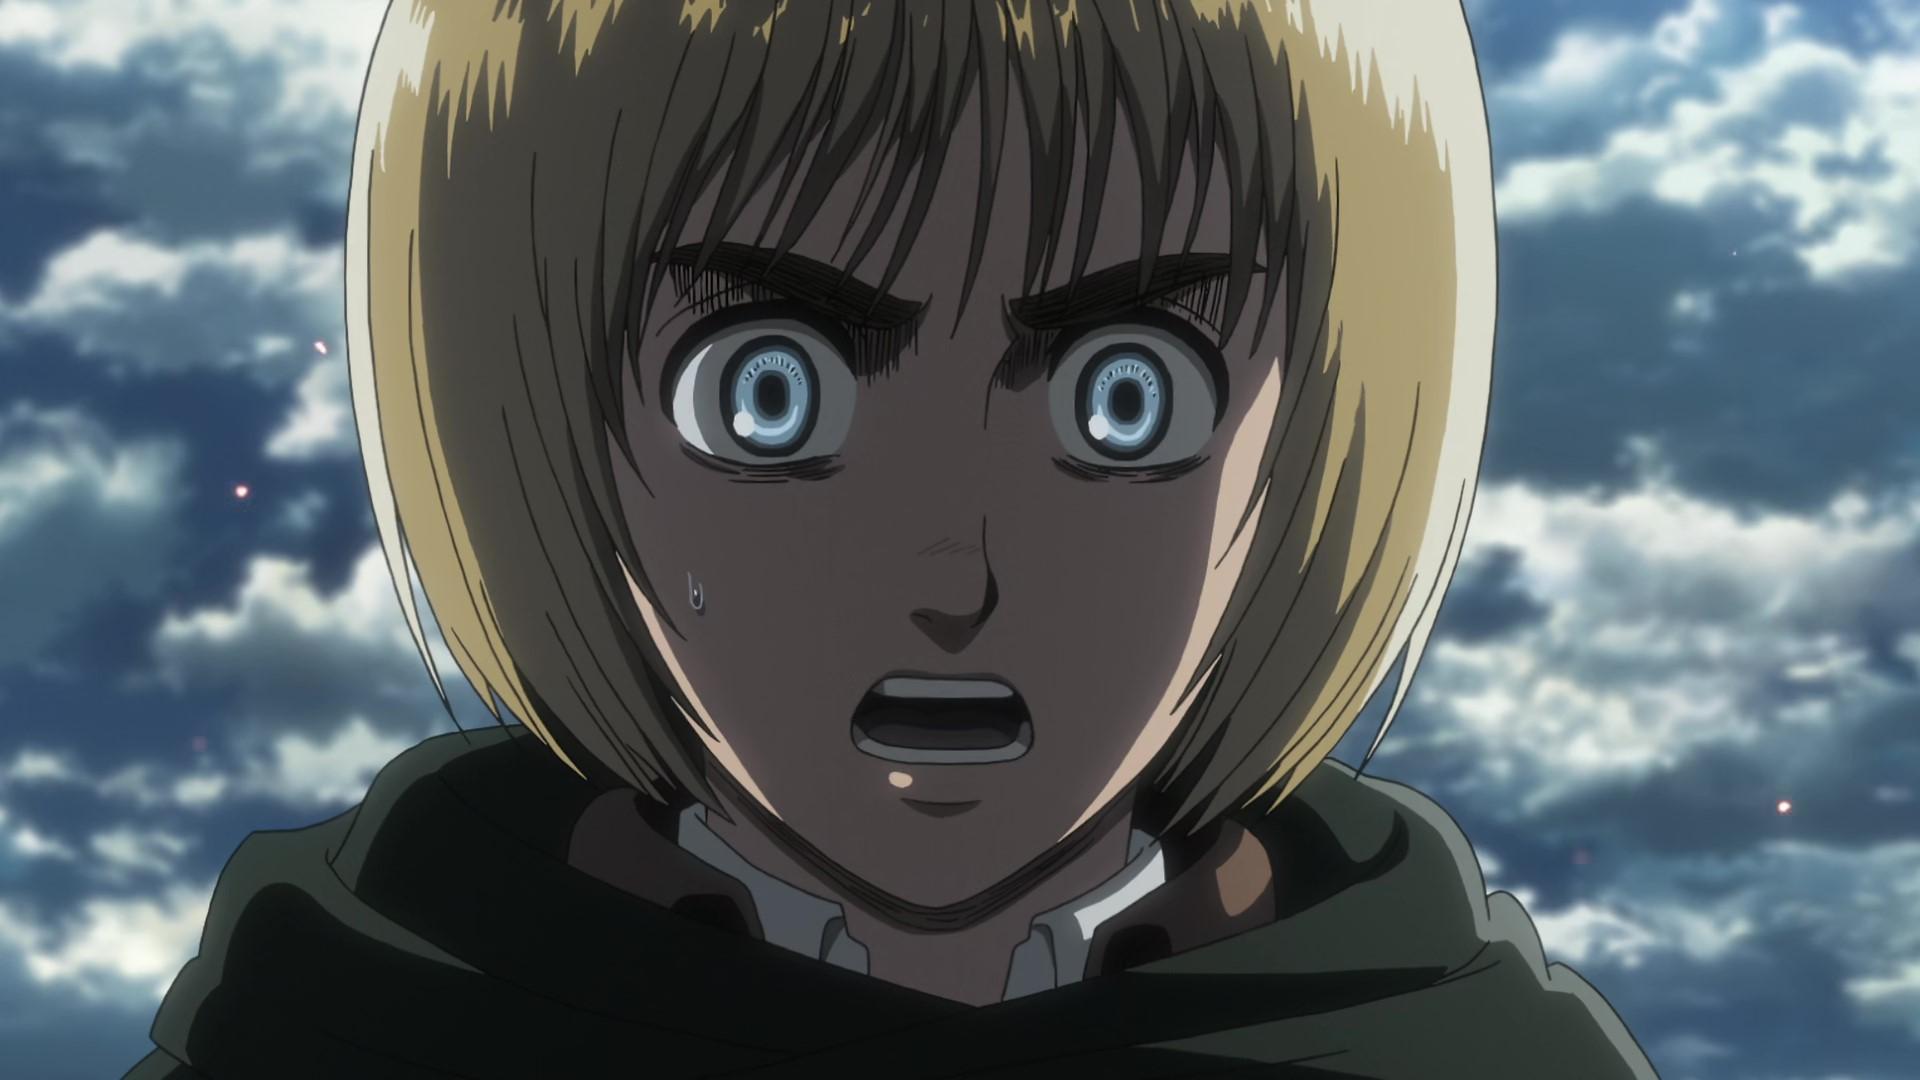 Attack on Titan Season 3 Episode 17 English Dubbed - AnimeGT